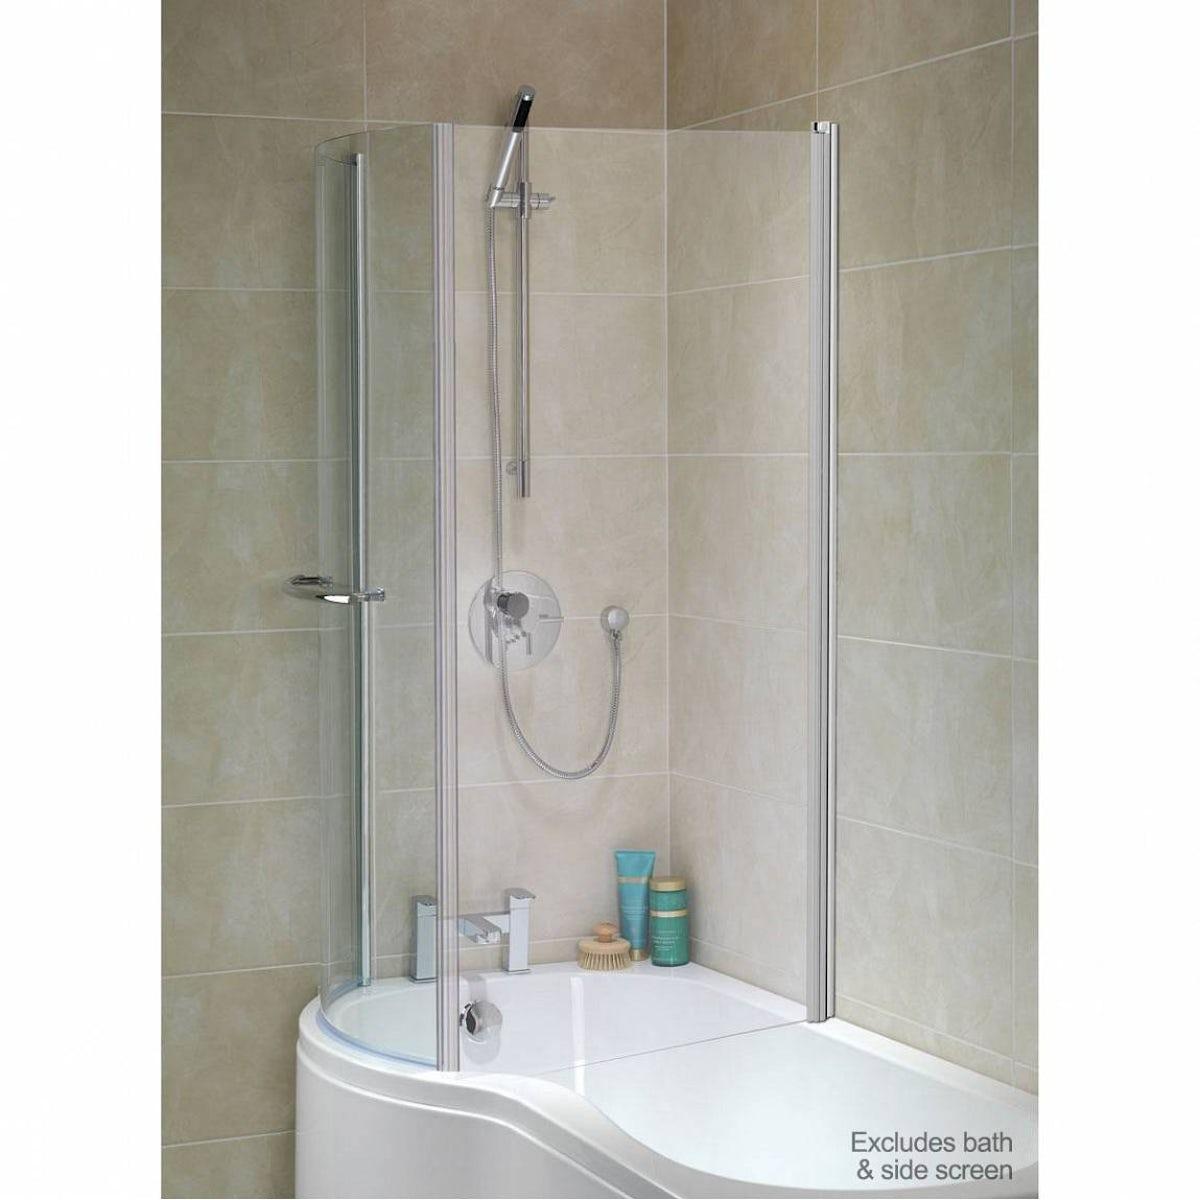 Shower Screen For P Shaped Bath 6mm Glass Door For P Shaped Shower Bath Victoriaplum Com